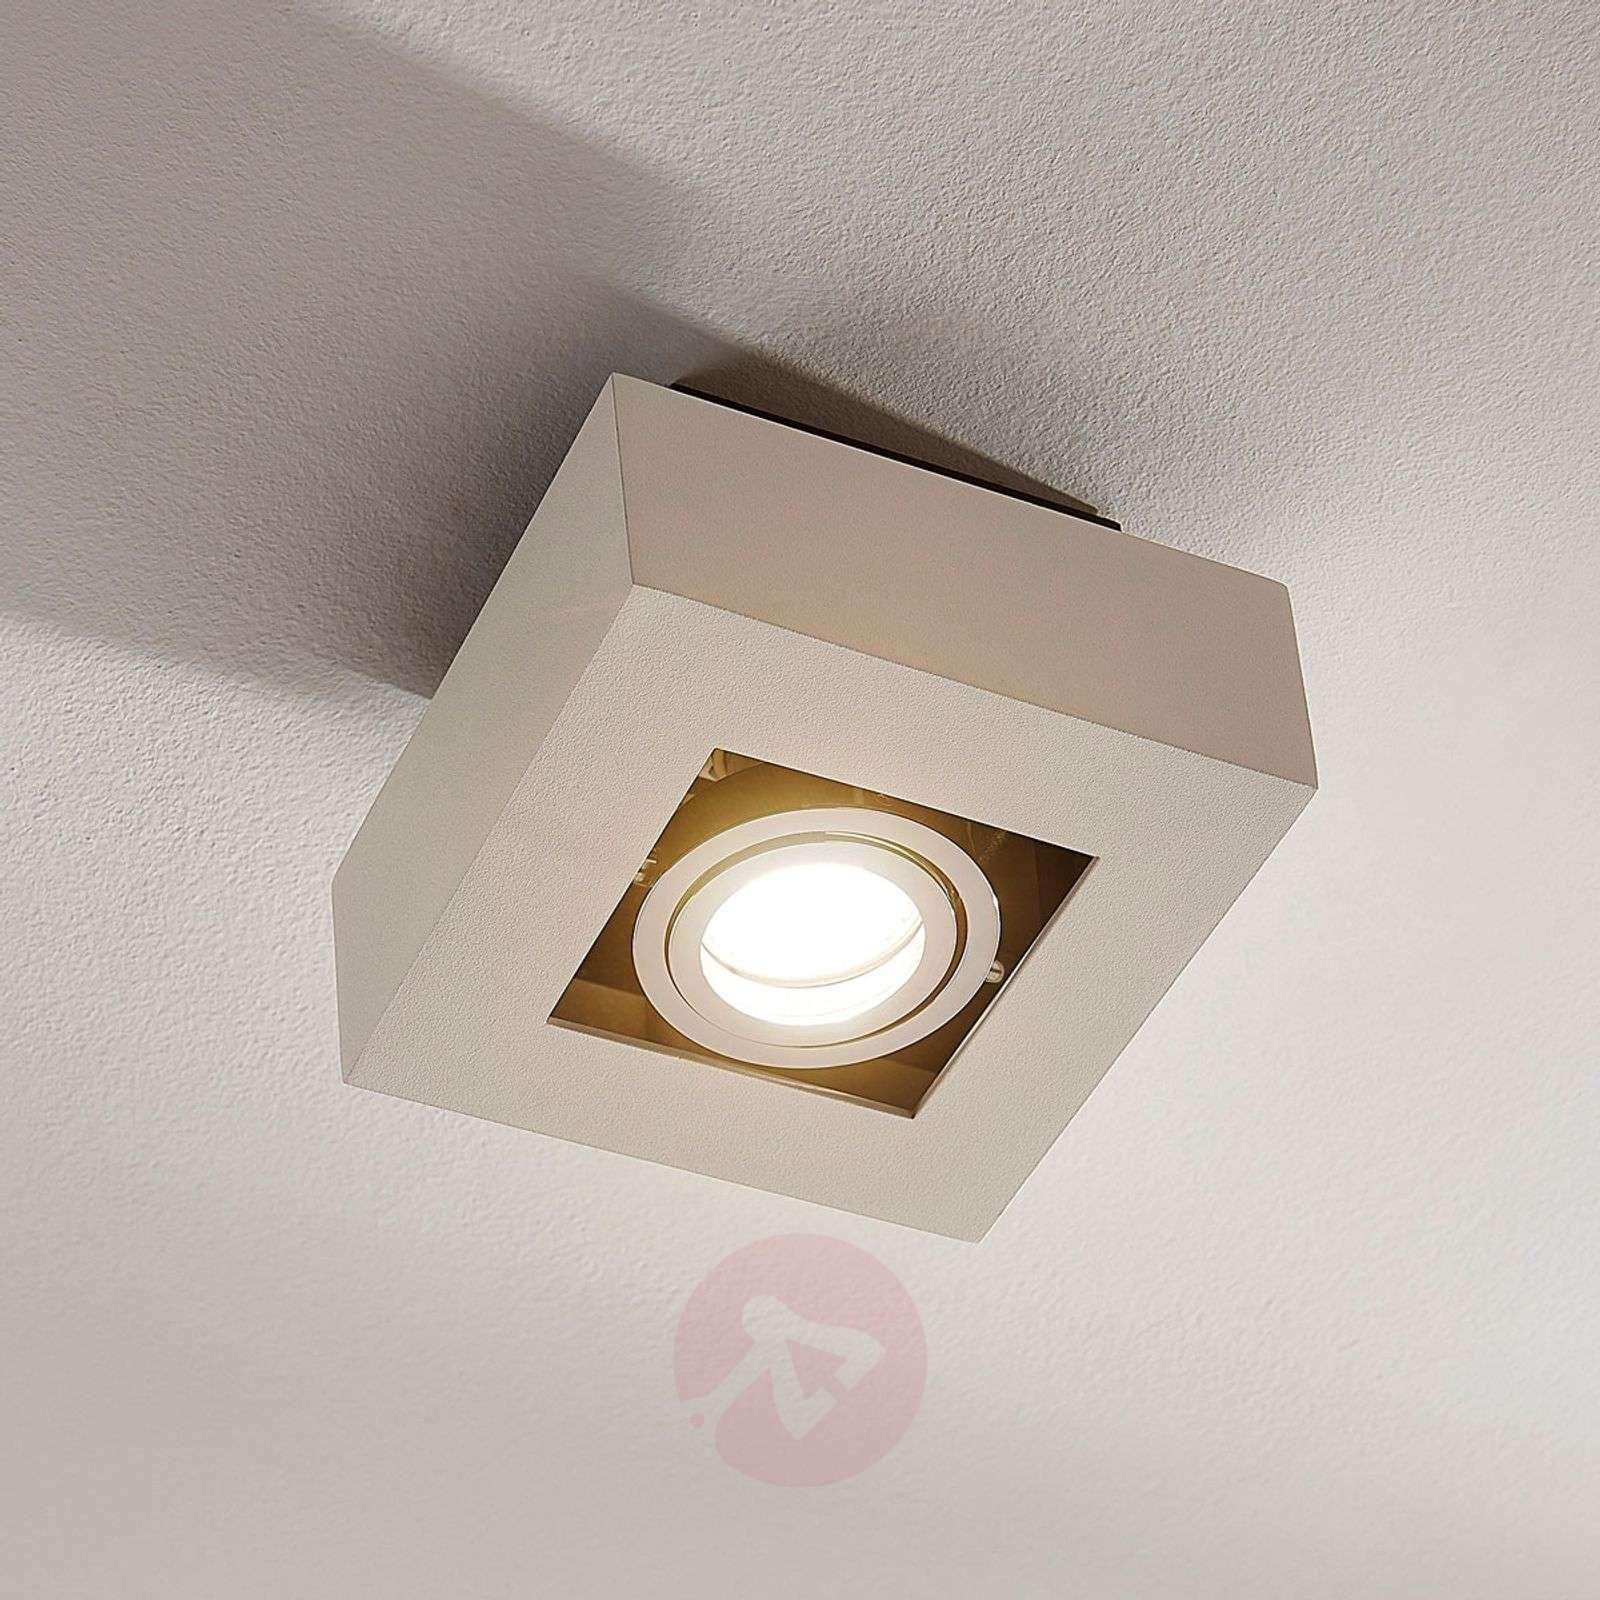 Kulmikas LED-kattovalaisin Vince valkoisena-9620456-01